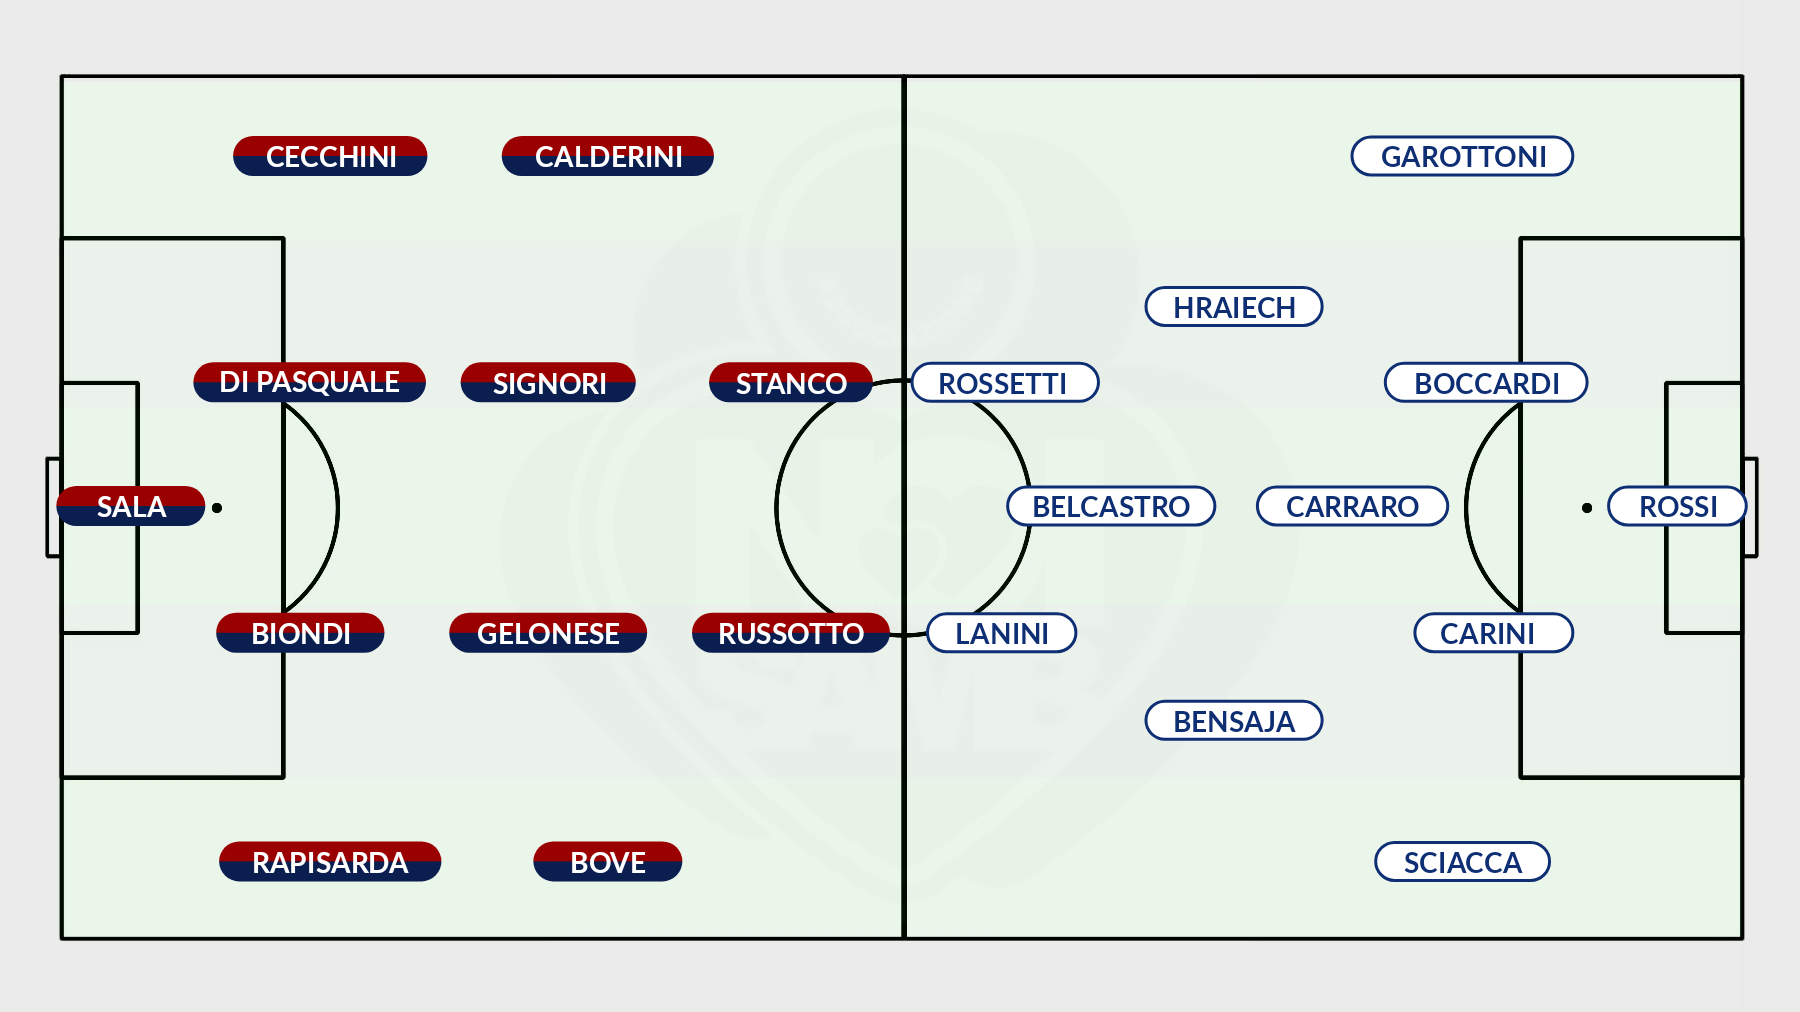 Samb-Imolese 2-1